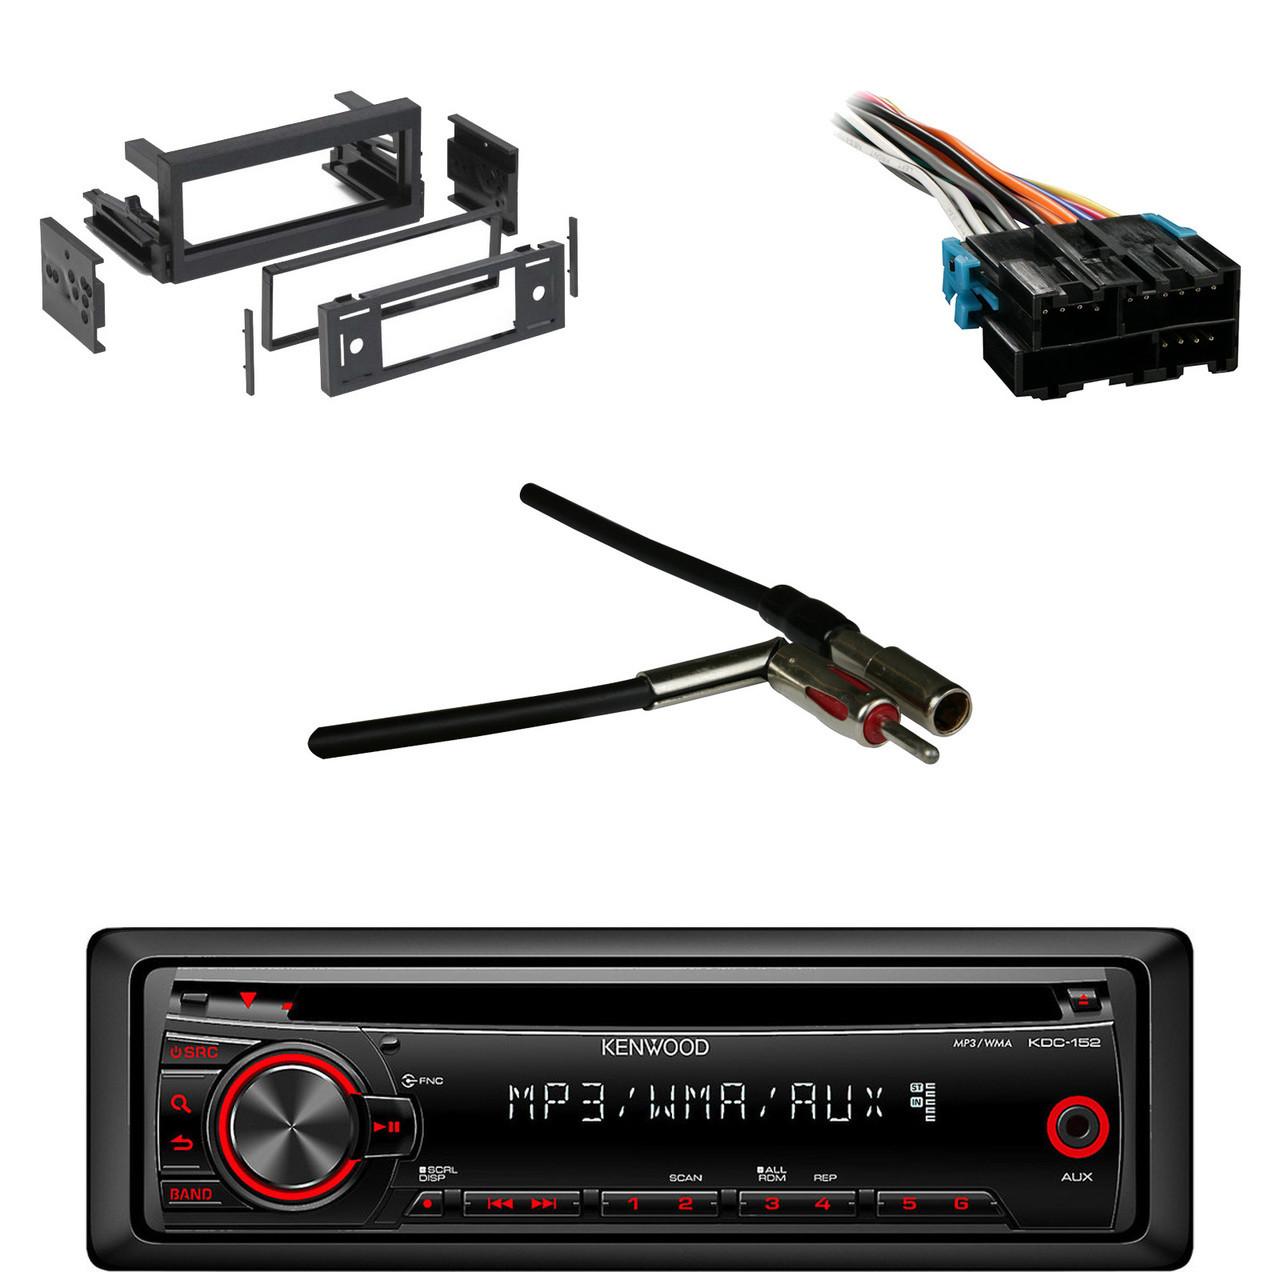 KDC152 AUX CD Car Radio, Metra Wire Harness, GM DIN Kit, Metra Antenna on kenwood kdc 138 wire harness, 152 wiring harness, kenwood 152 cd player, kenwood kdc-152 manual,